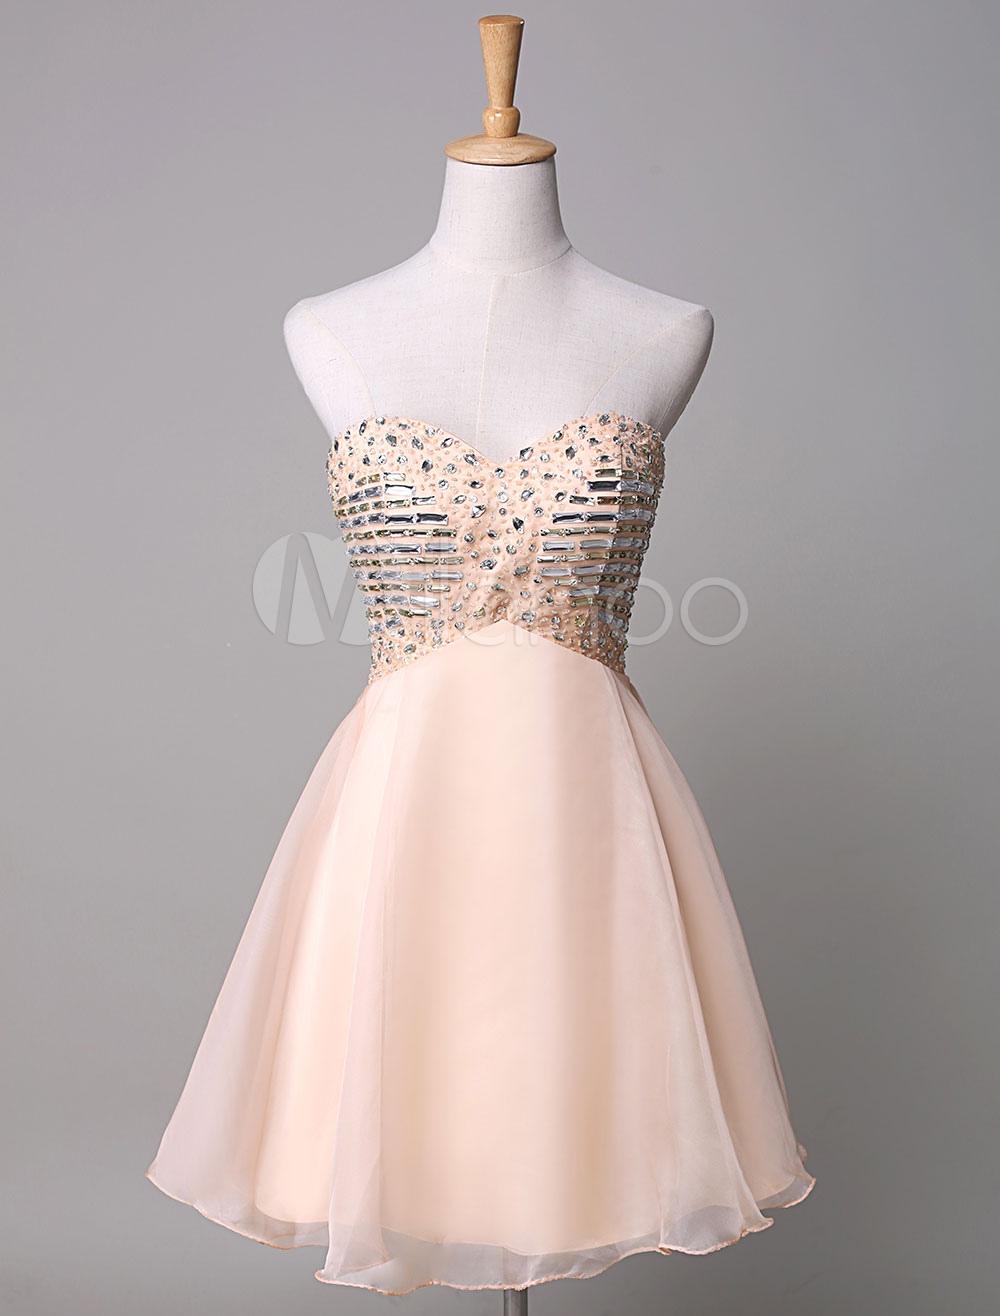 Chiffon Prom Dress Strapless Beading A-Line Mini Cocktail Dress (Wedding Cheap Party Dress) photo